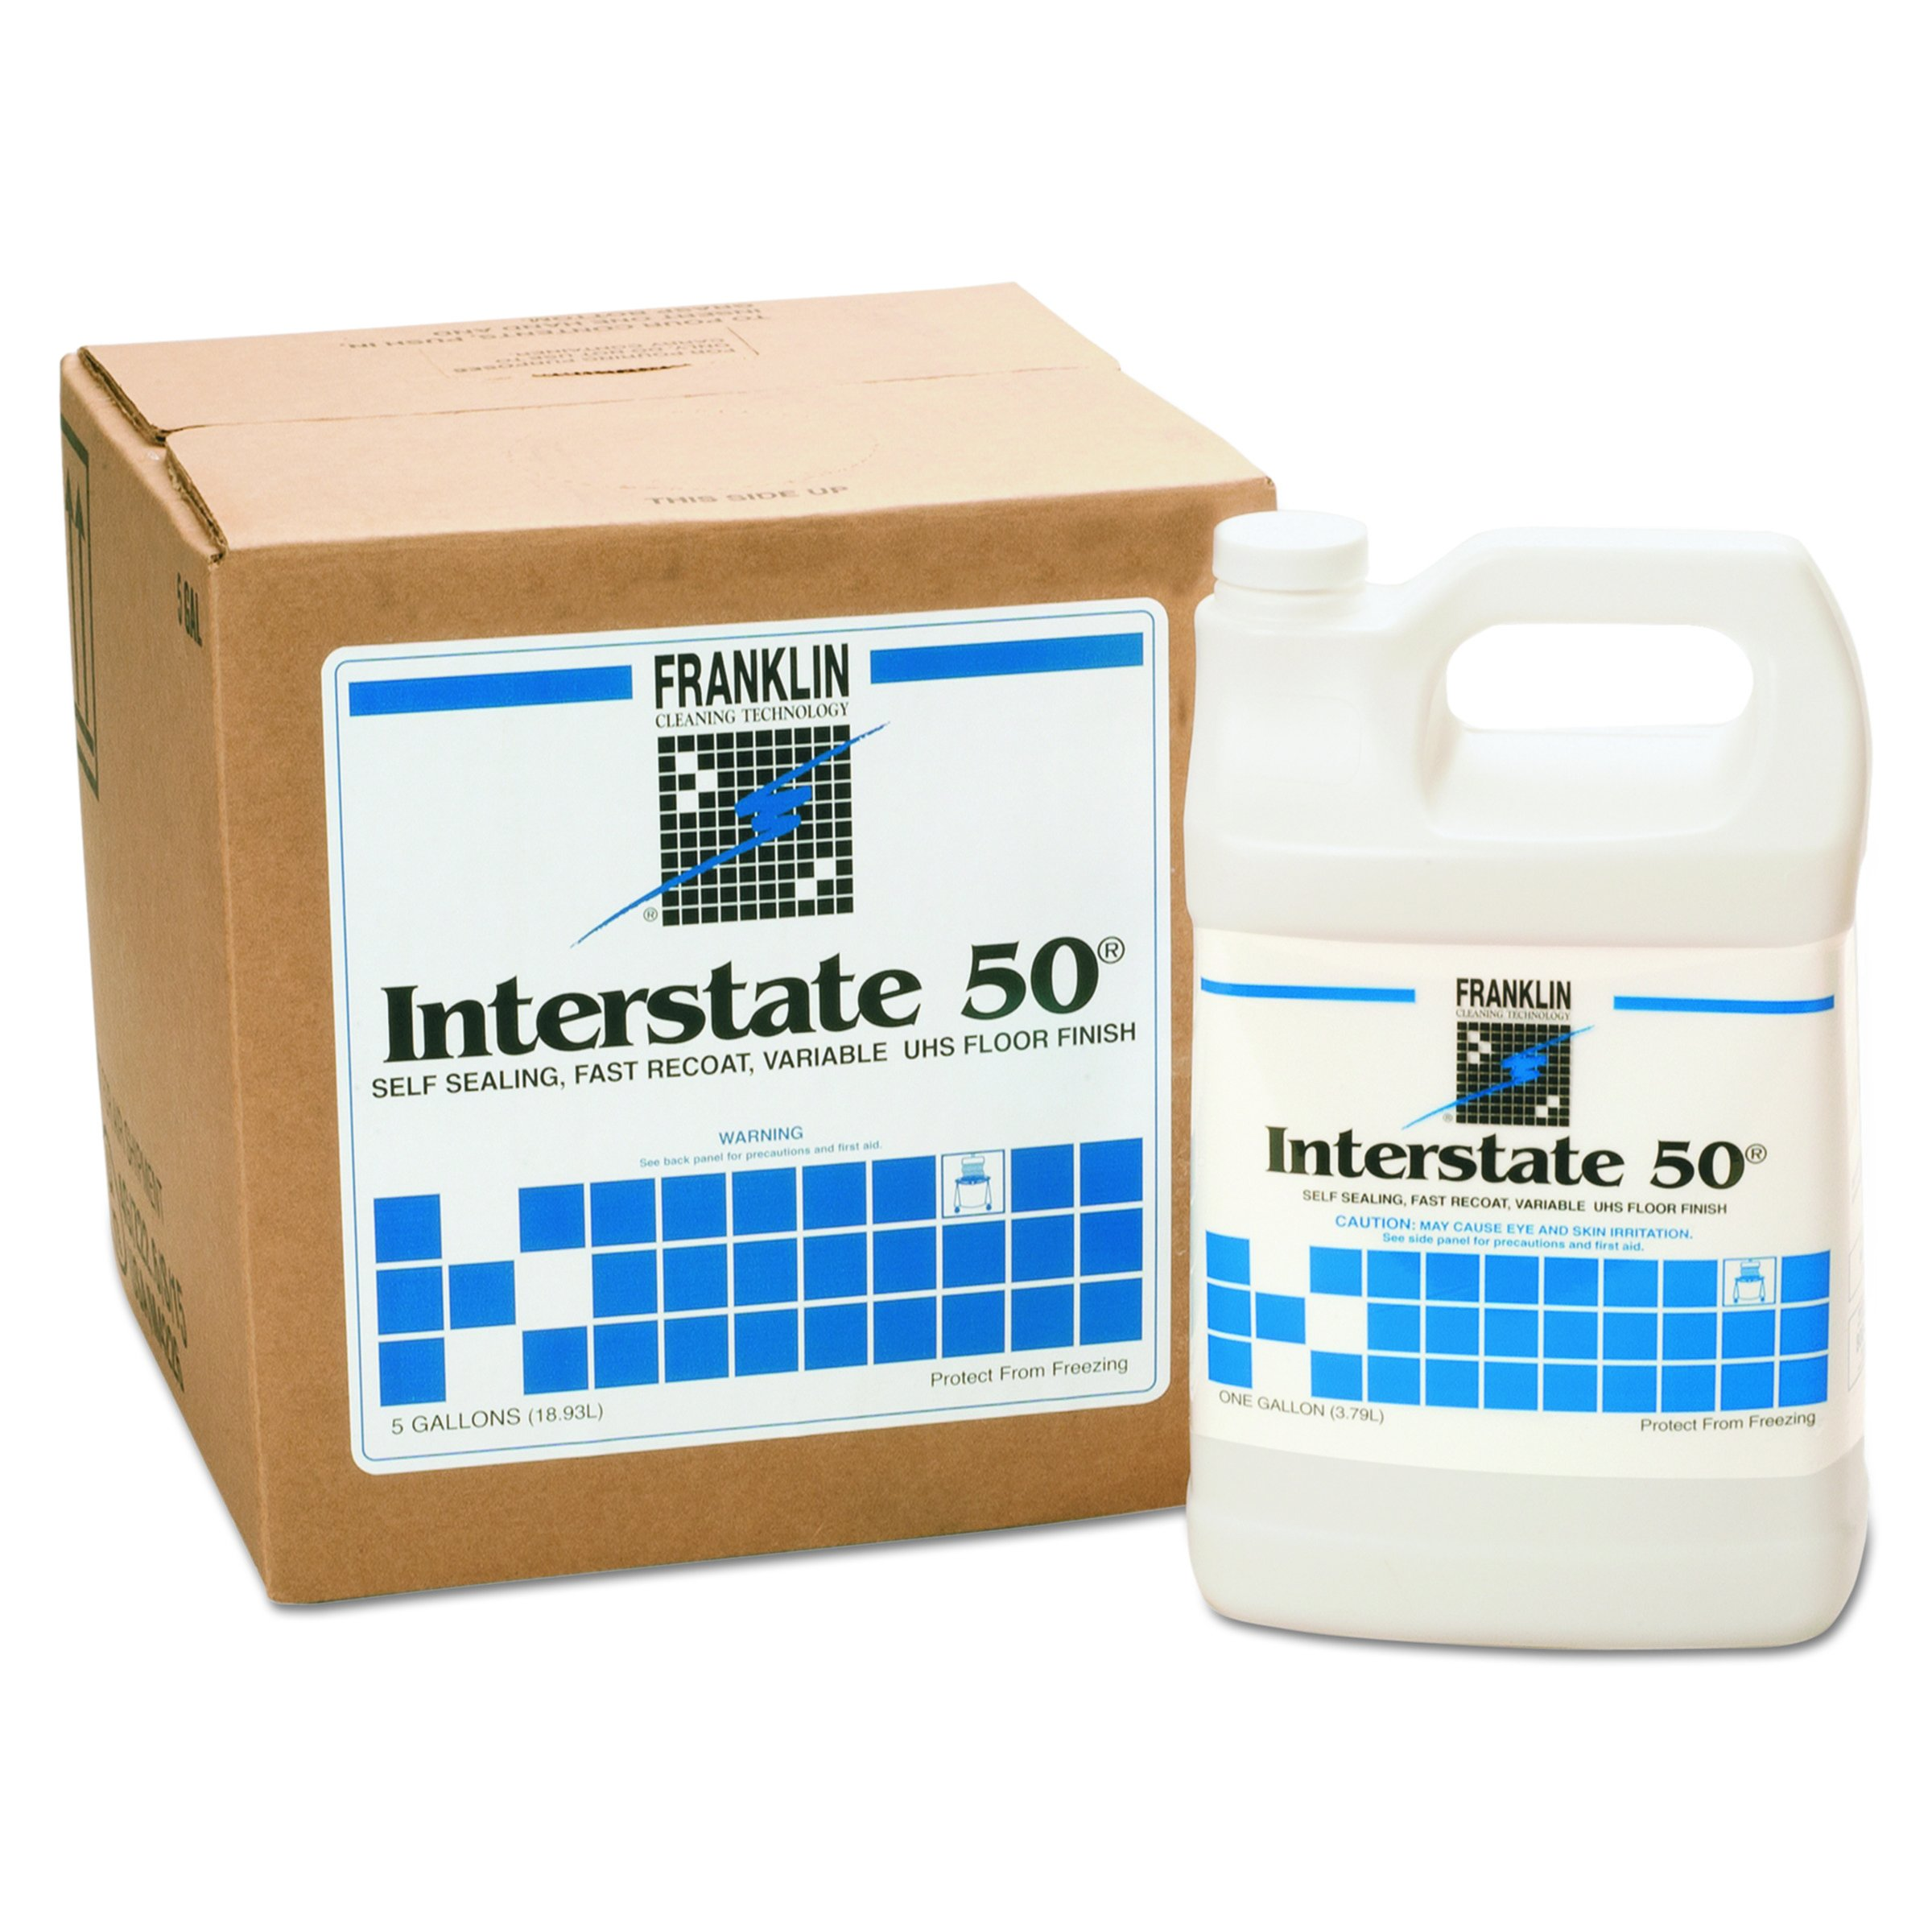 Franklin Cleaning Technology F195022CT Interstate 50 Floor Finish, 1 Gallon Bottle (Case of 4 Bottles)